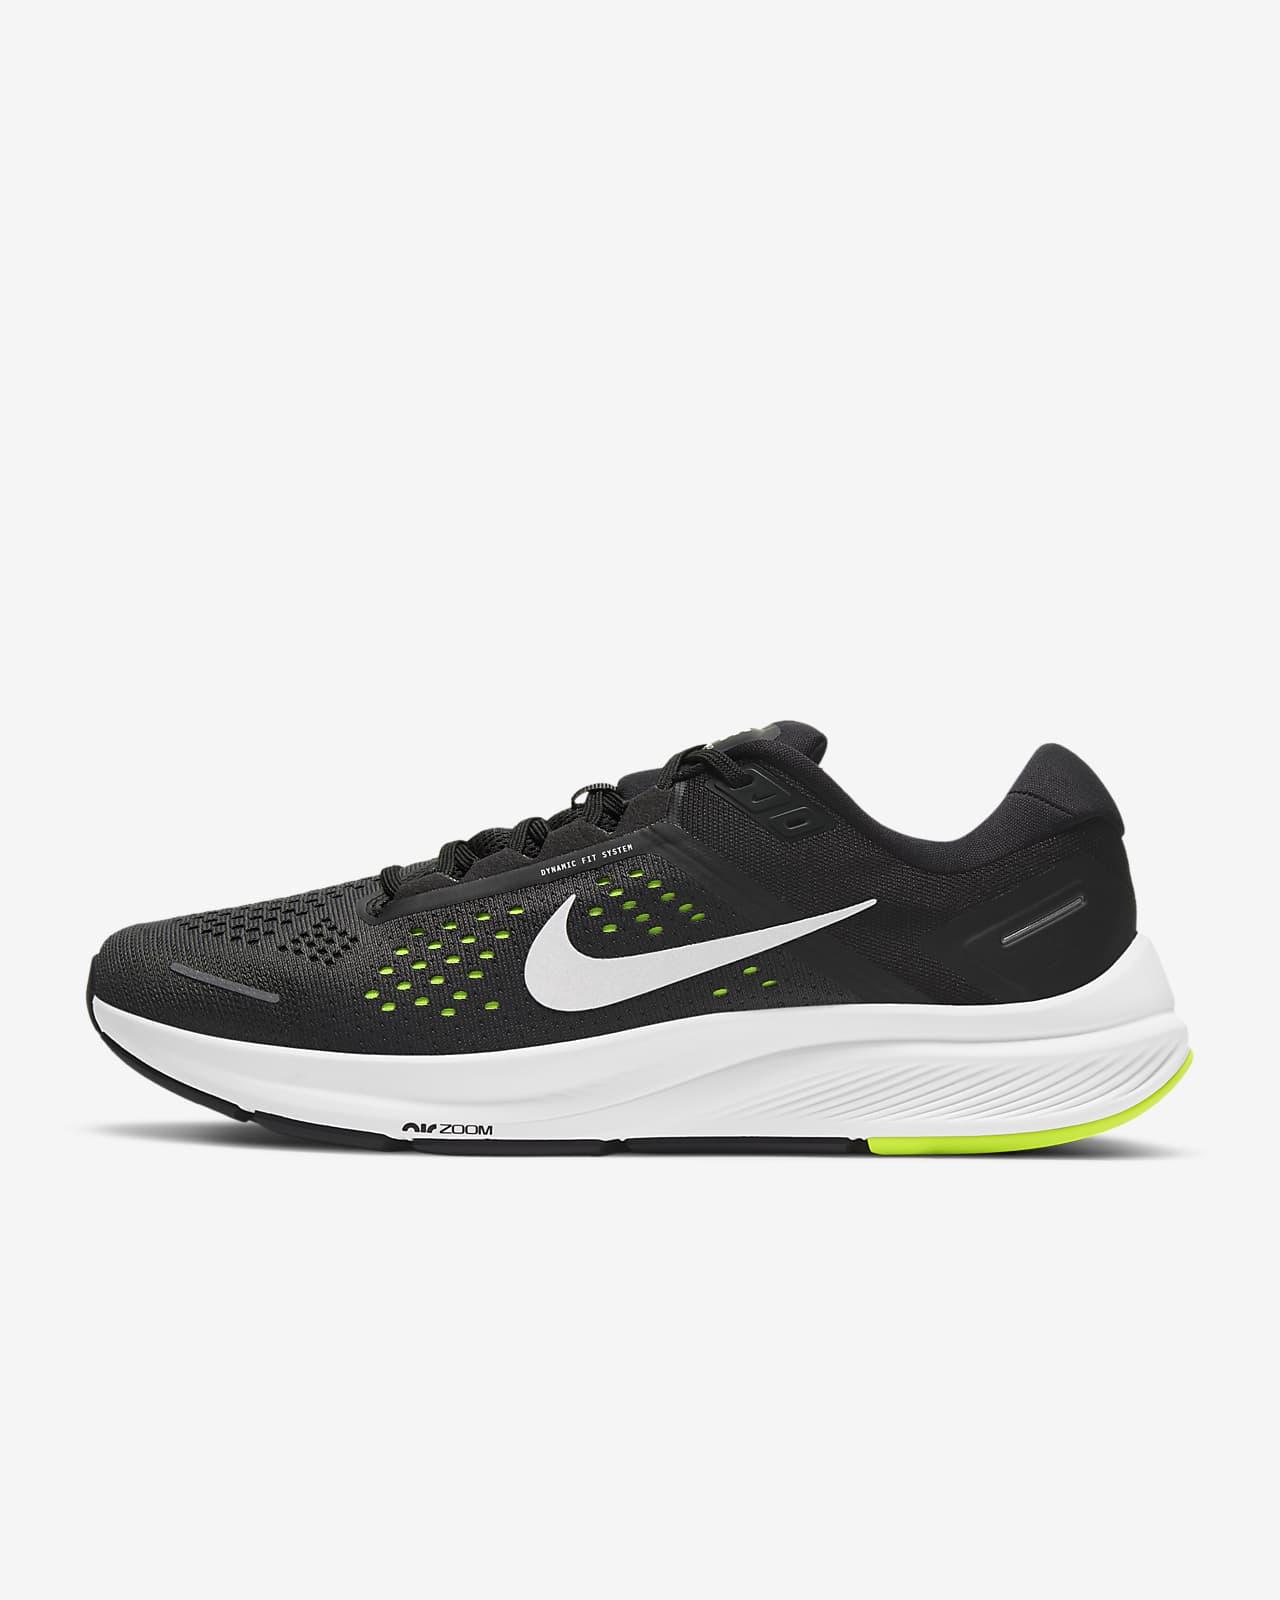 Nike Air Zoom Structure 23 男款路跑鞋